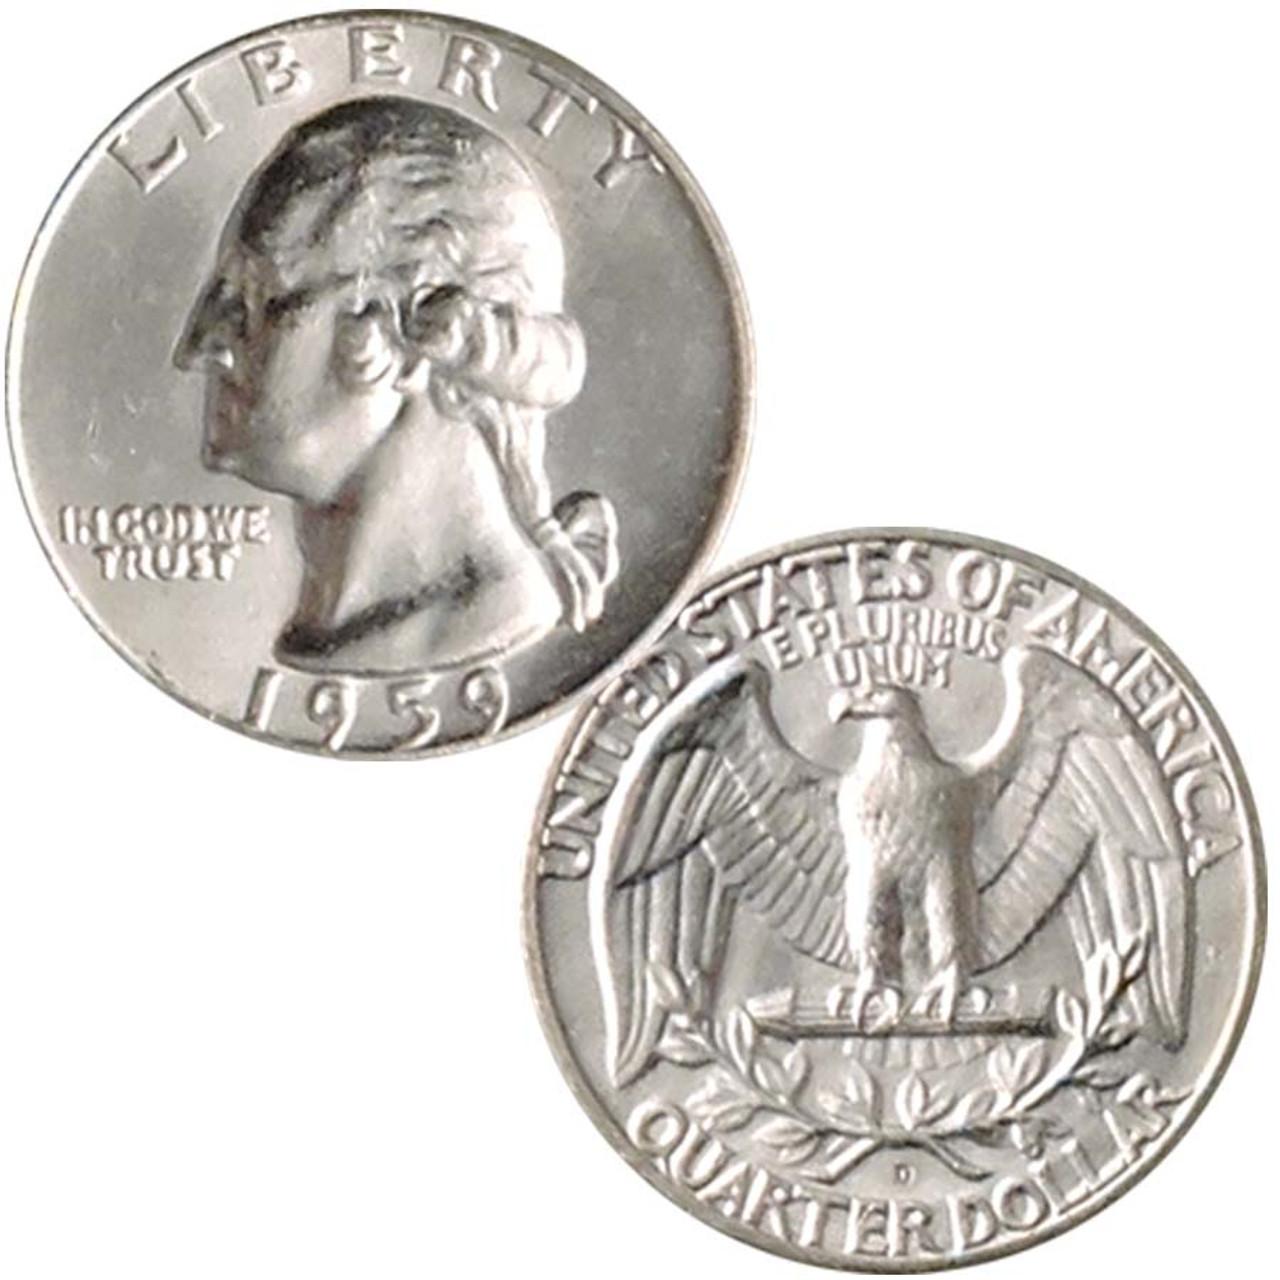 1959-D Washington Silver Quarter Brilliant Uncirculated Image 1